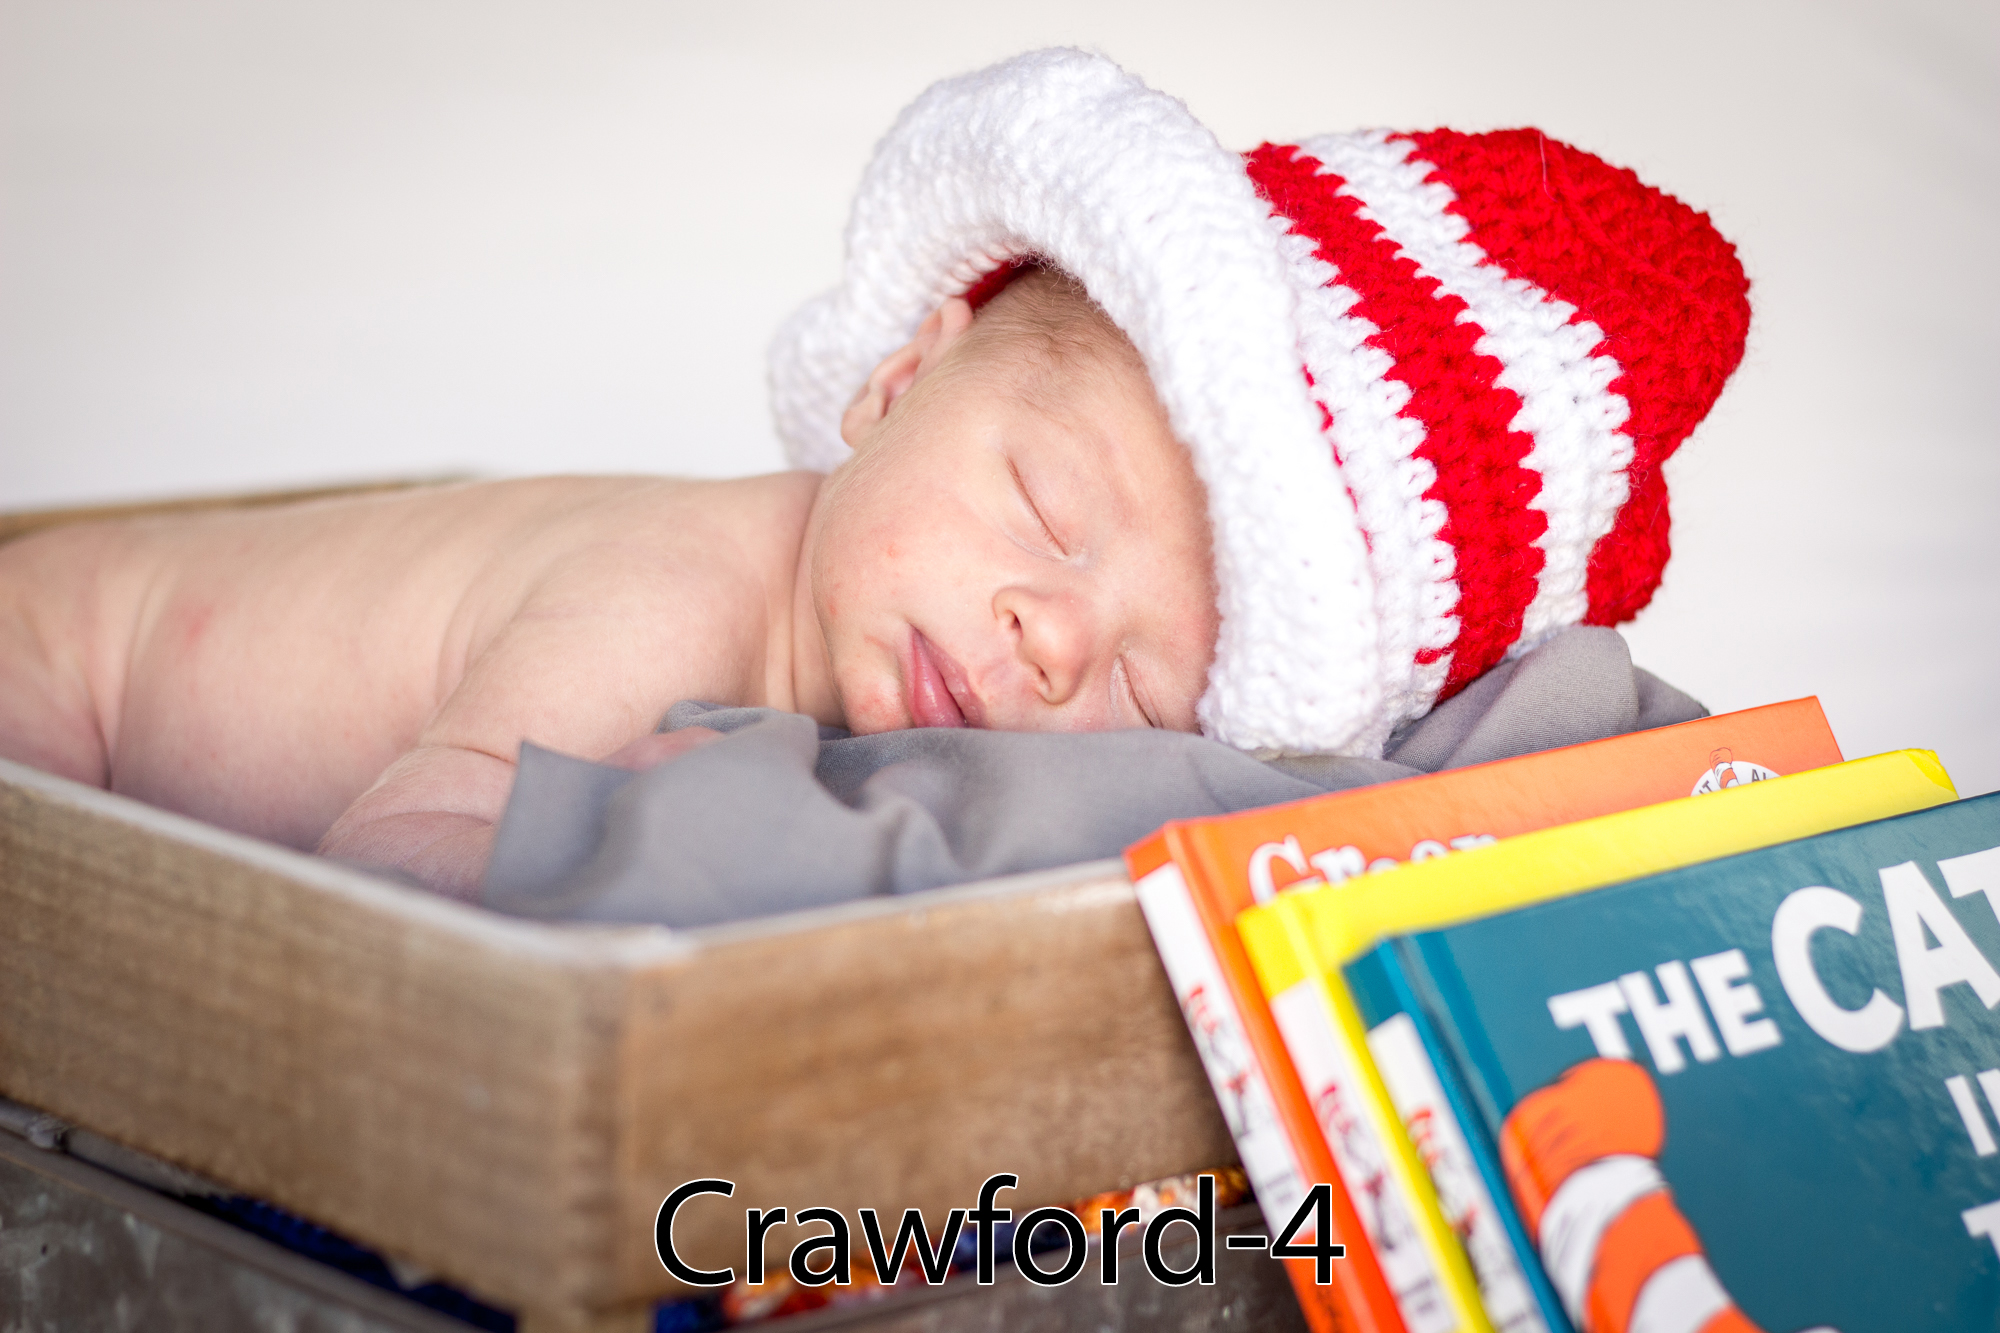 Crawford-4.jpg